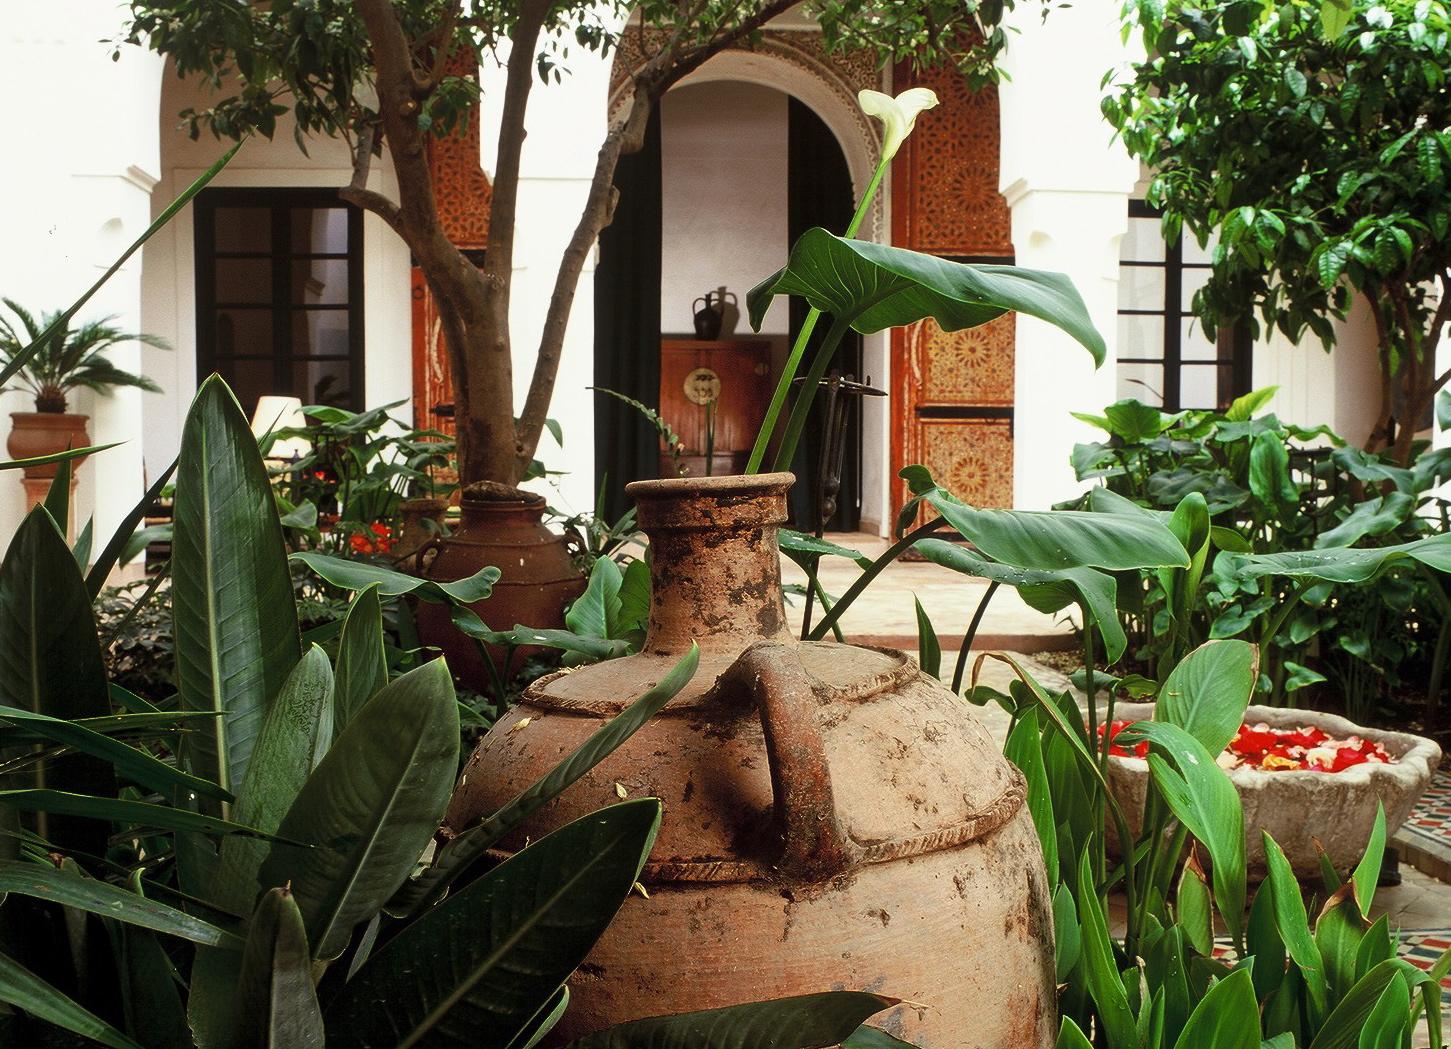 Riyad el cadi an authentic marrakech riad riyad el cadi - Olive garden early bird specials ...